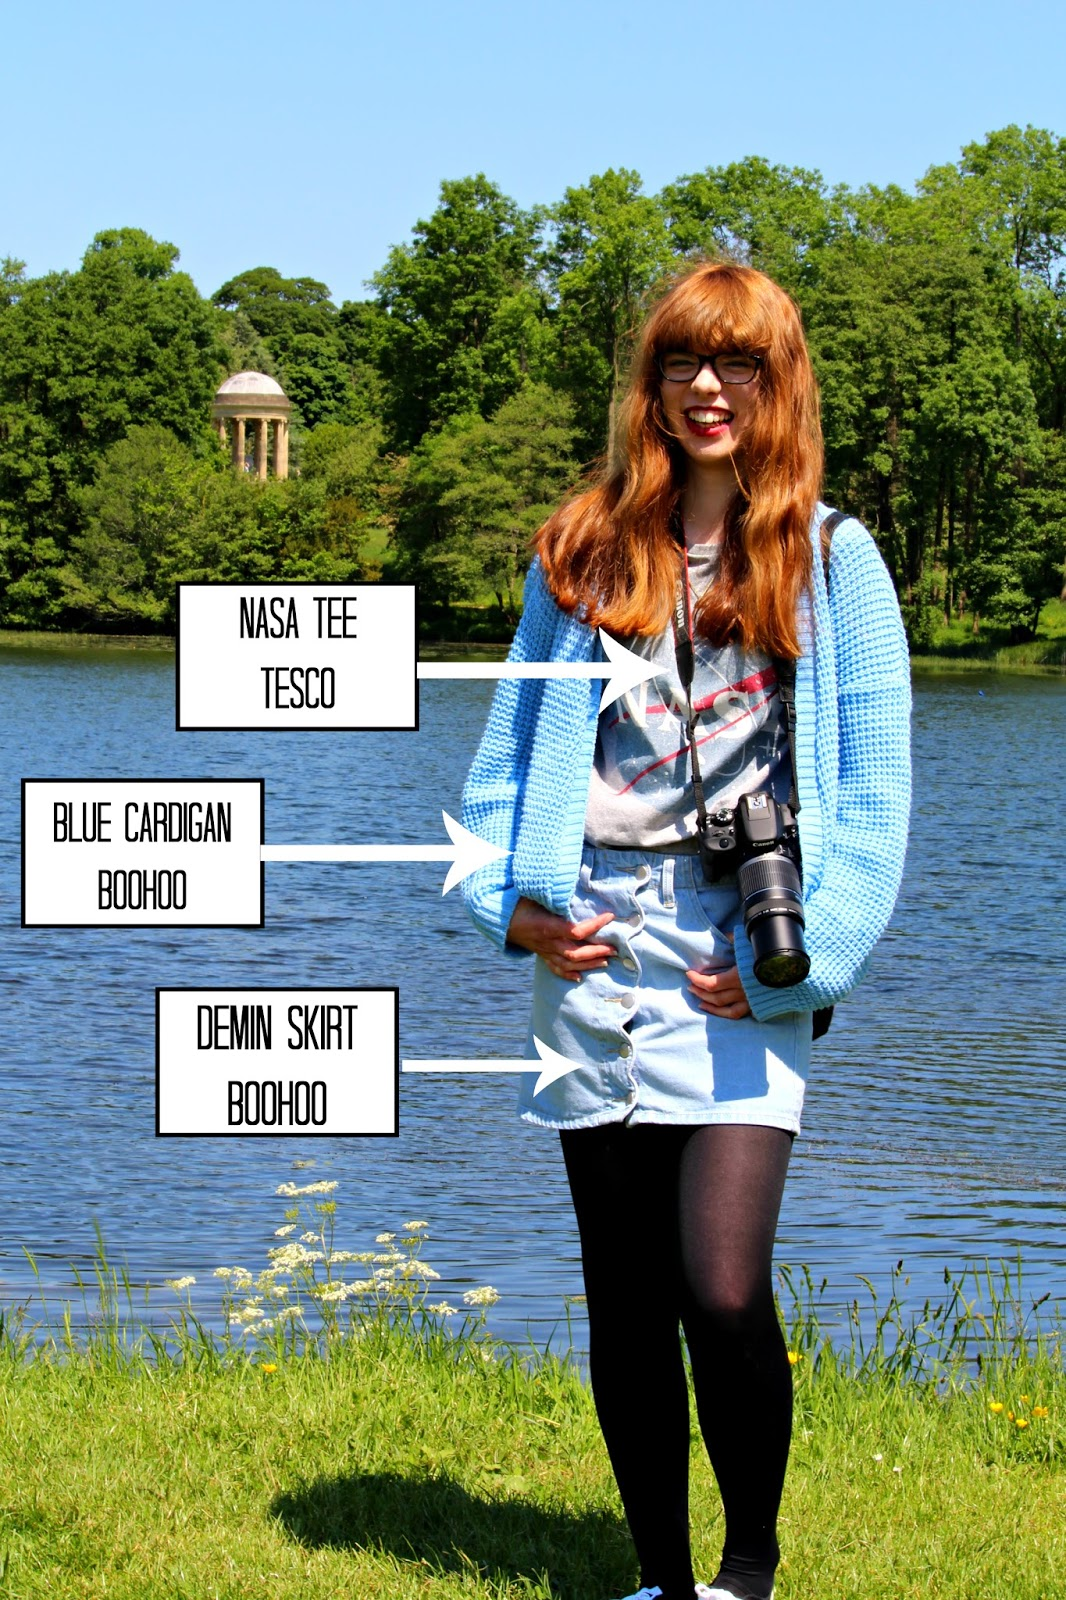 NASA Tee men's clothing Topshop fashion blogger